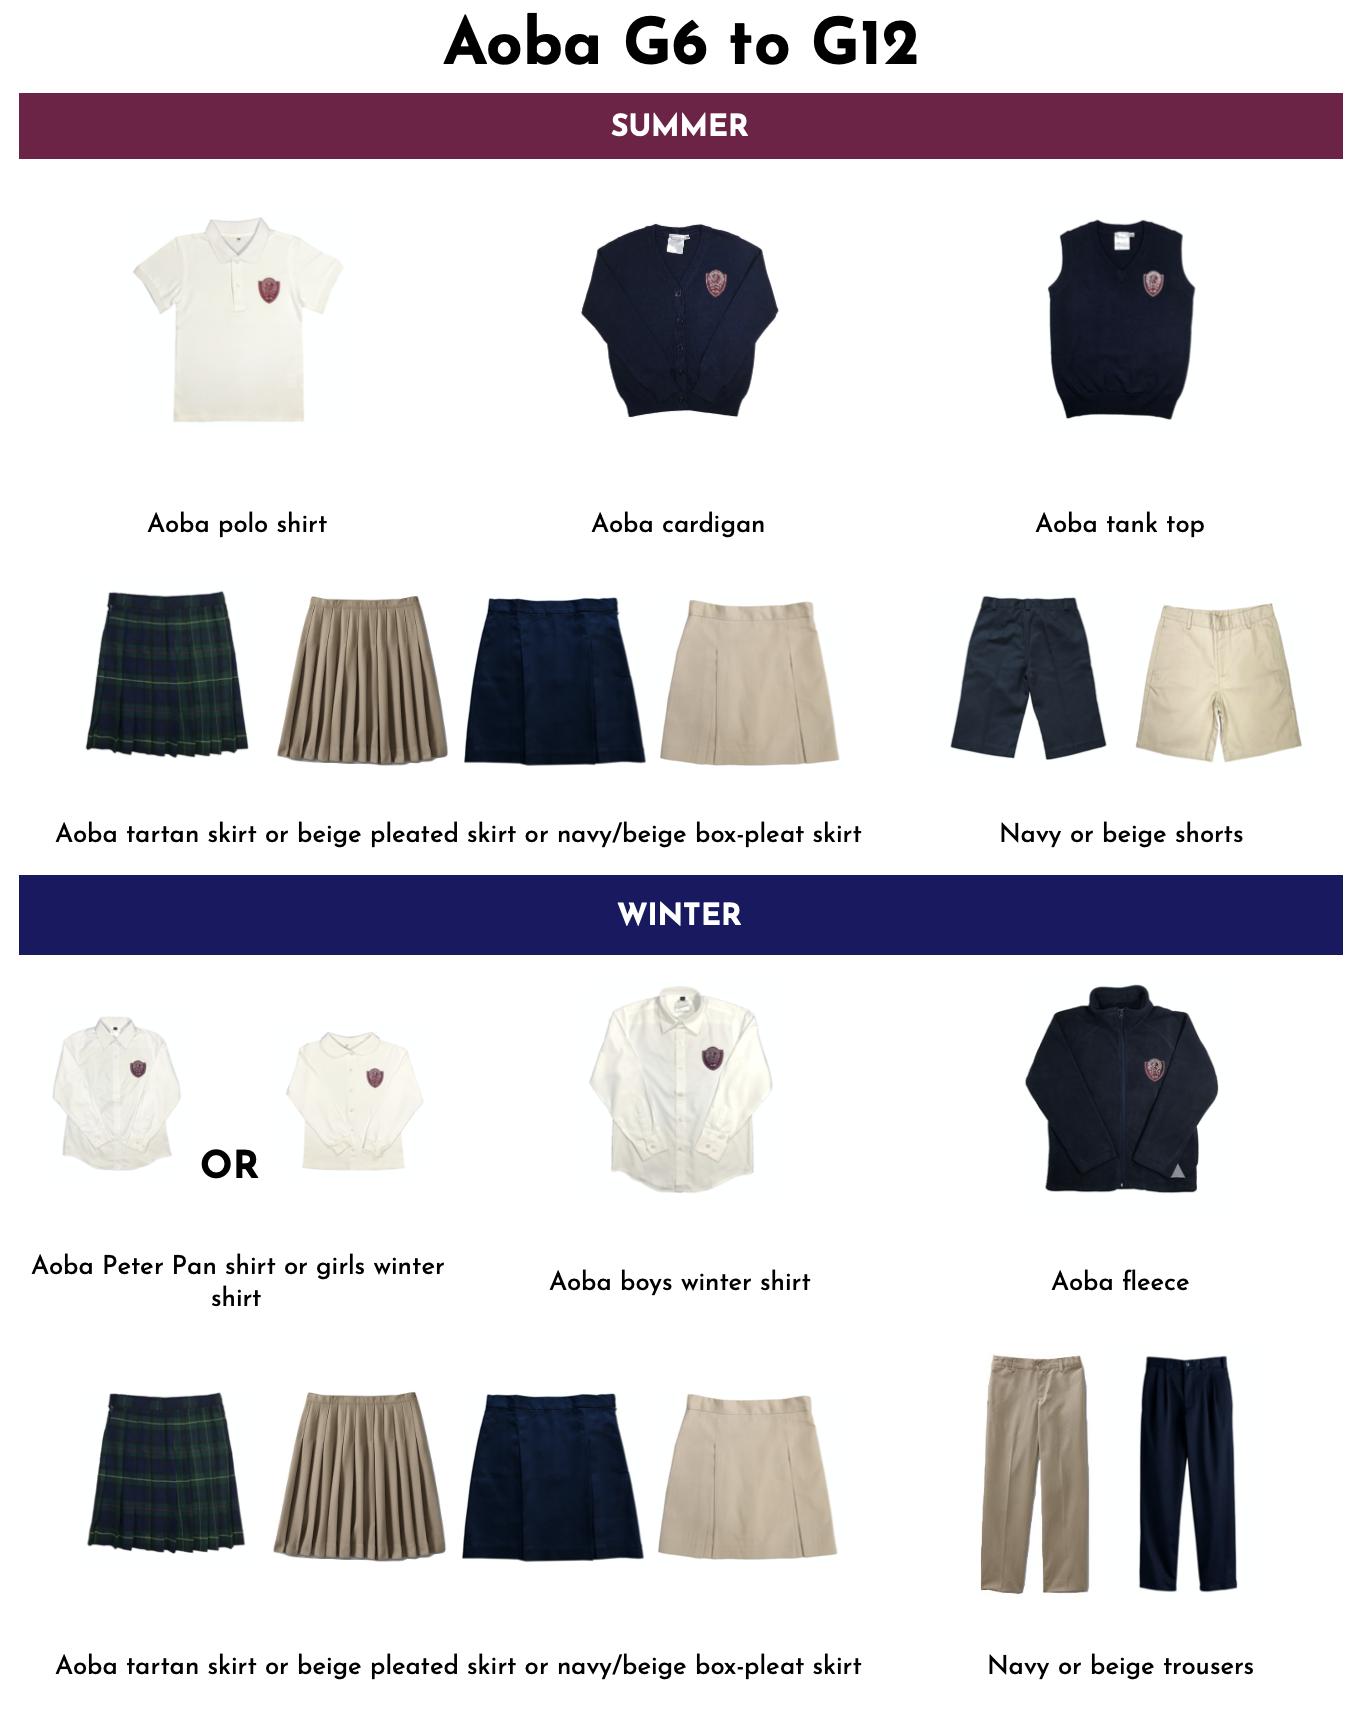 aoba-uniform-guide-2021-9.png